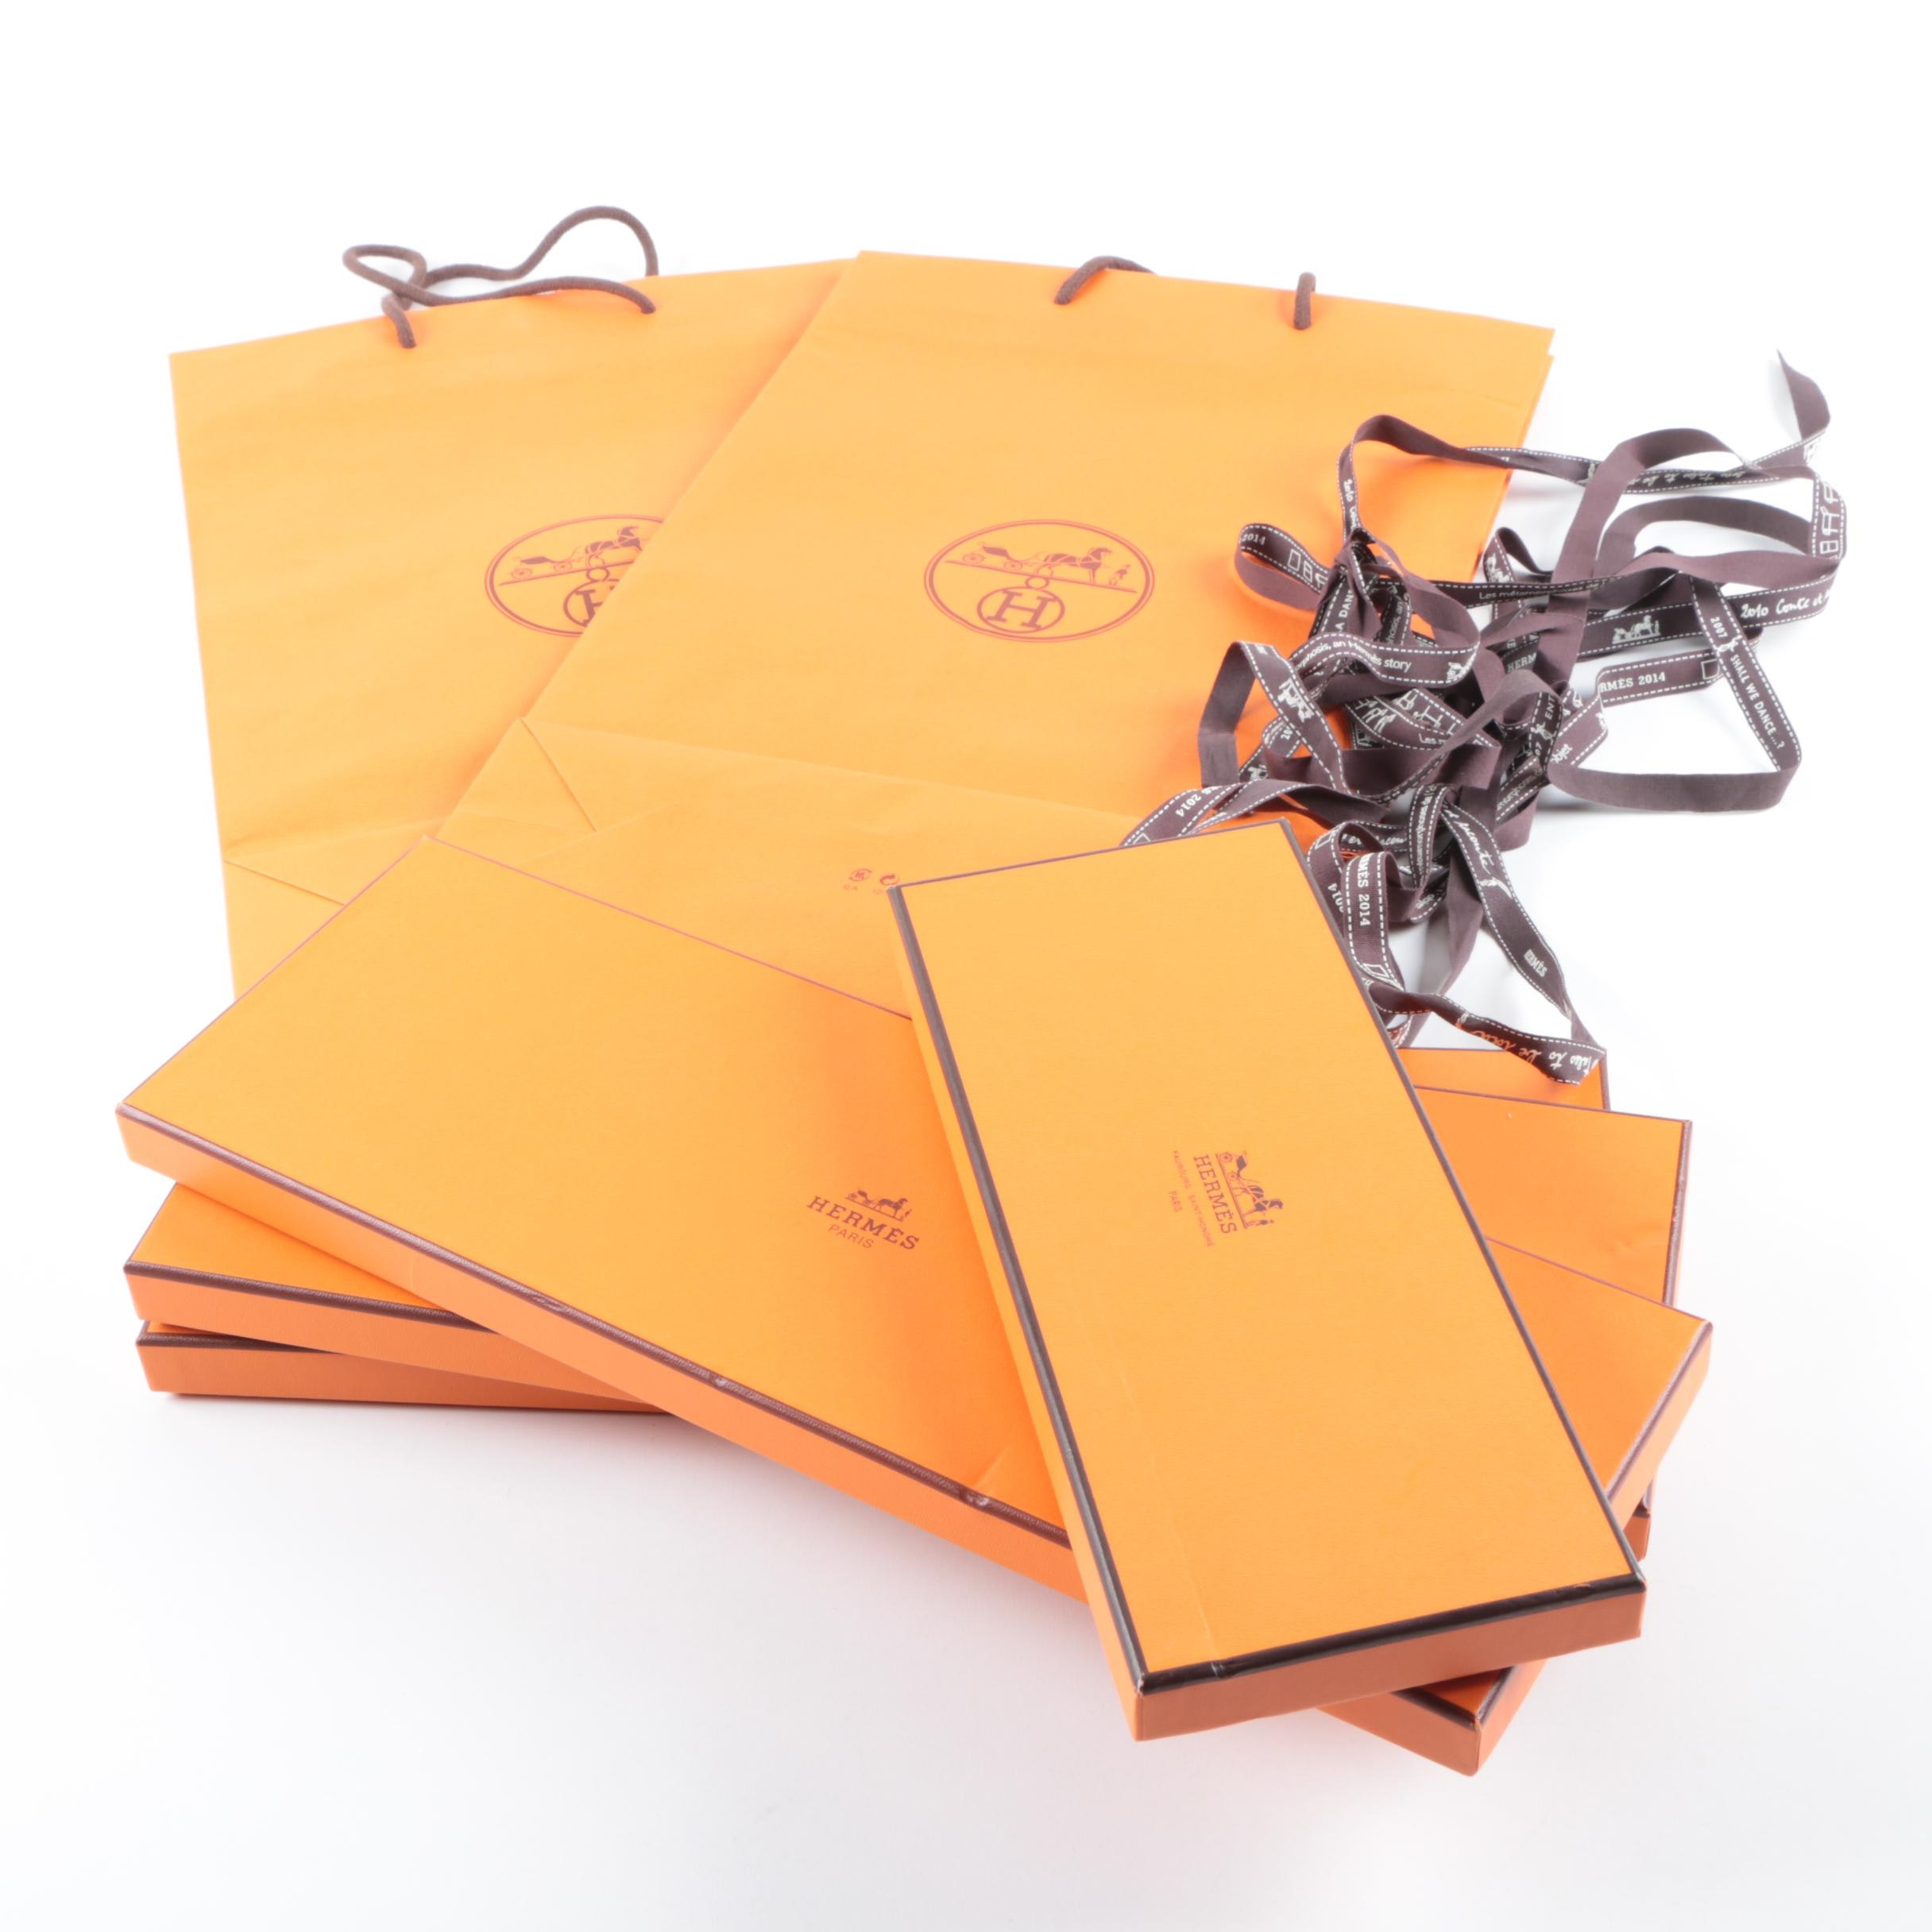 Hermès Boxes, Bolduc Ribbons and Bags